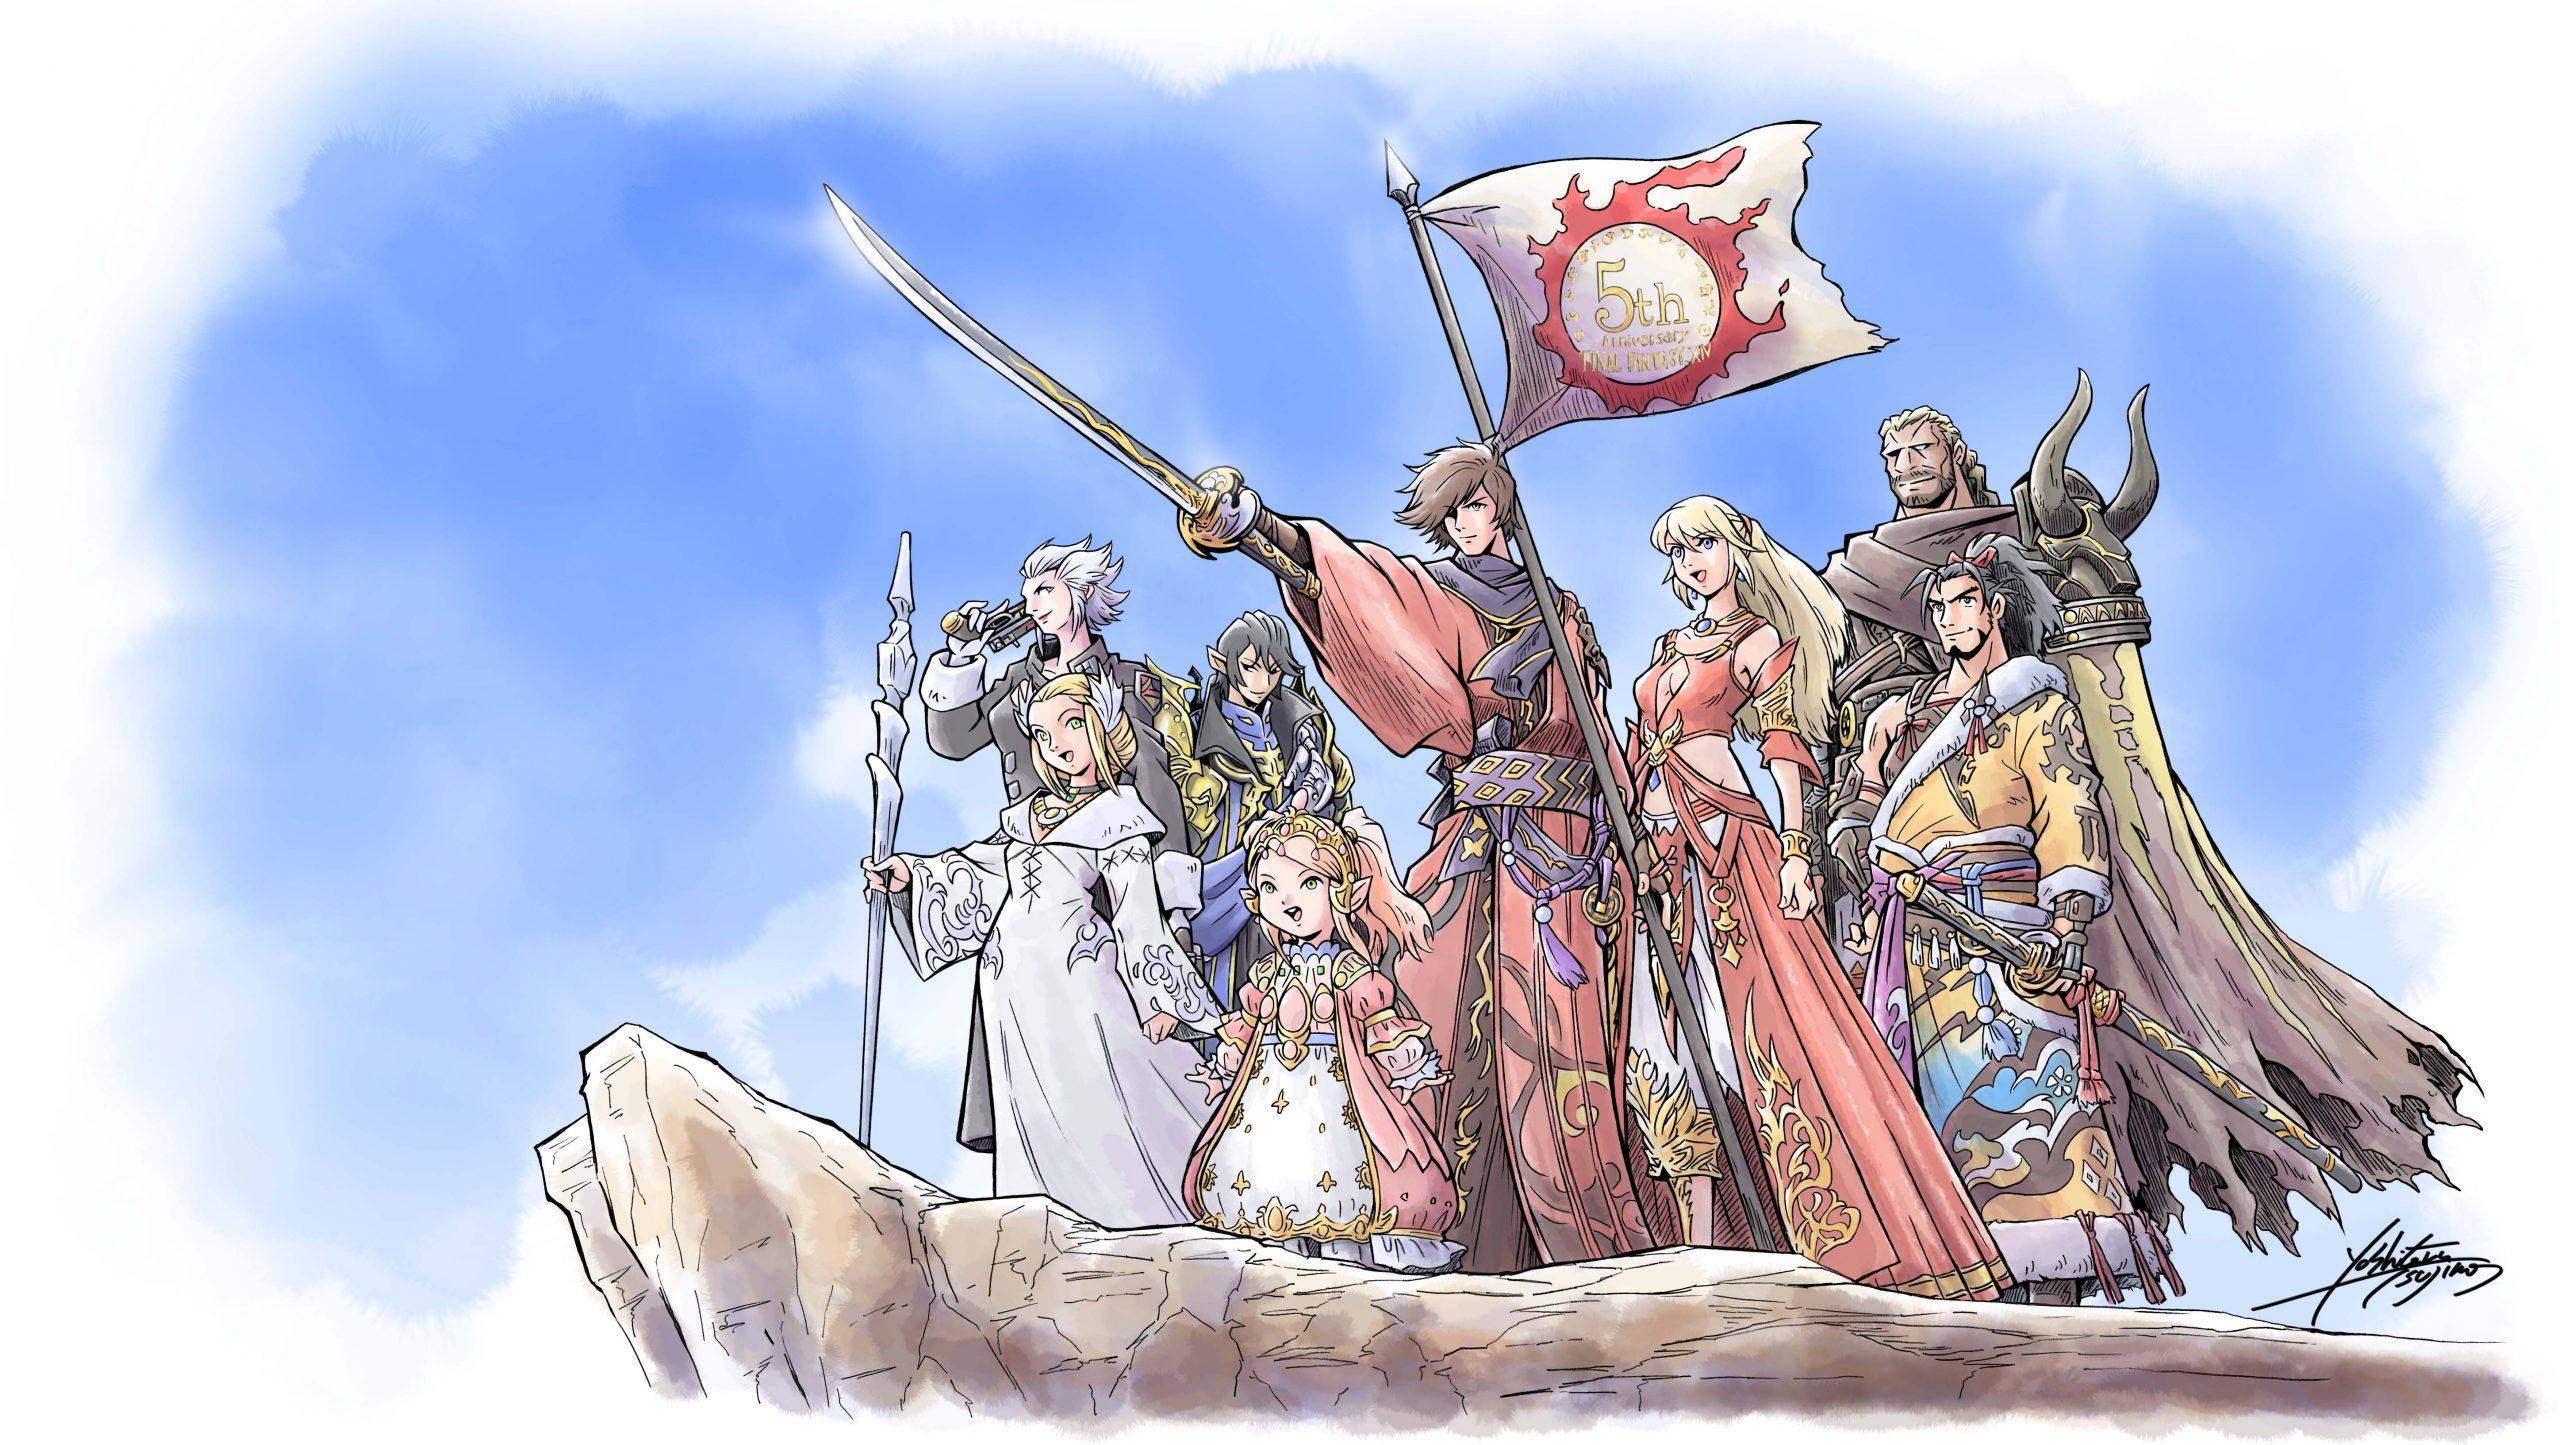 Final Fantasy XIV lidera 14 milhões de jogadores cumulativos